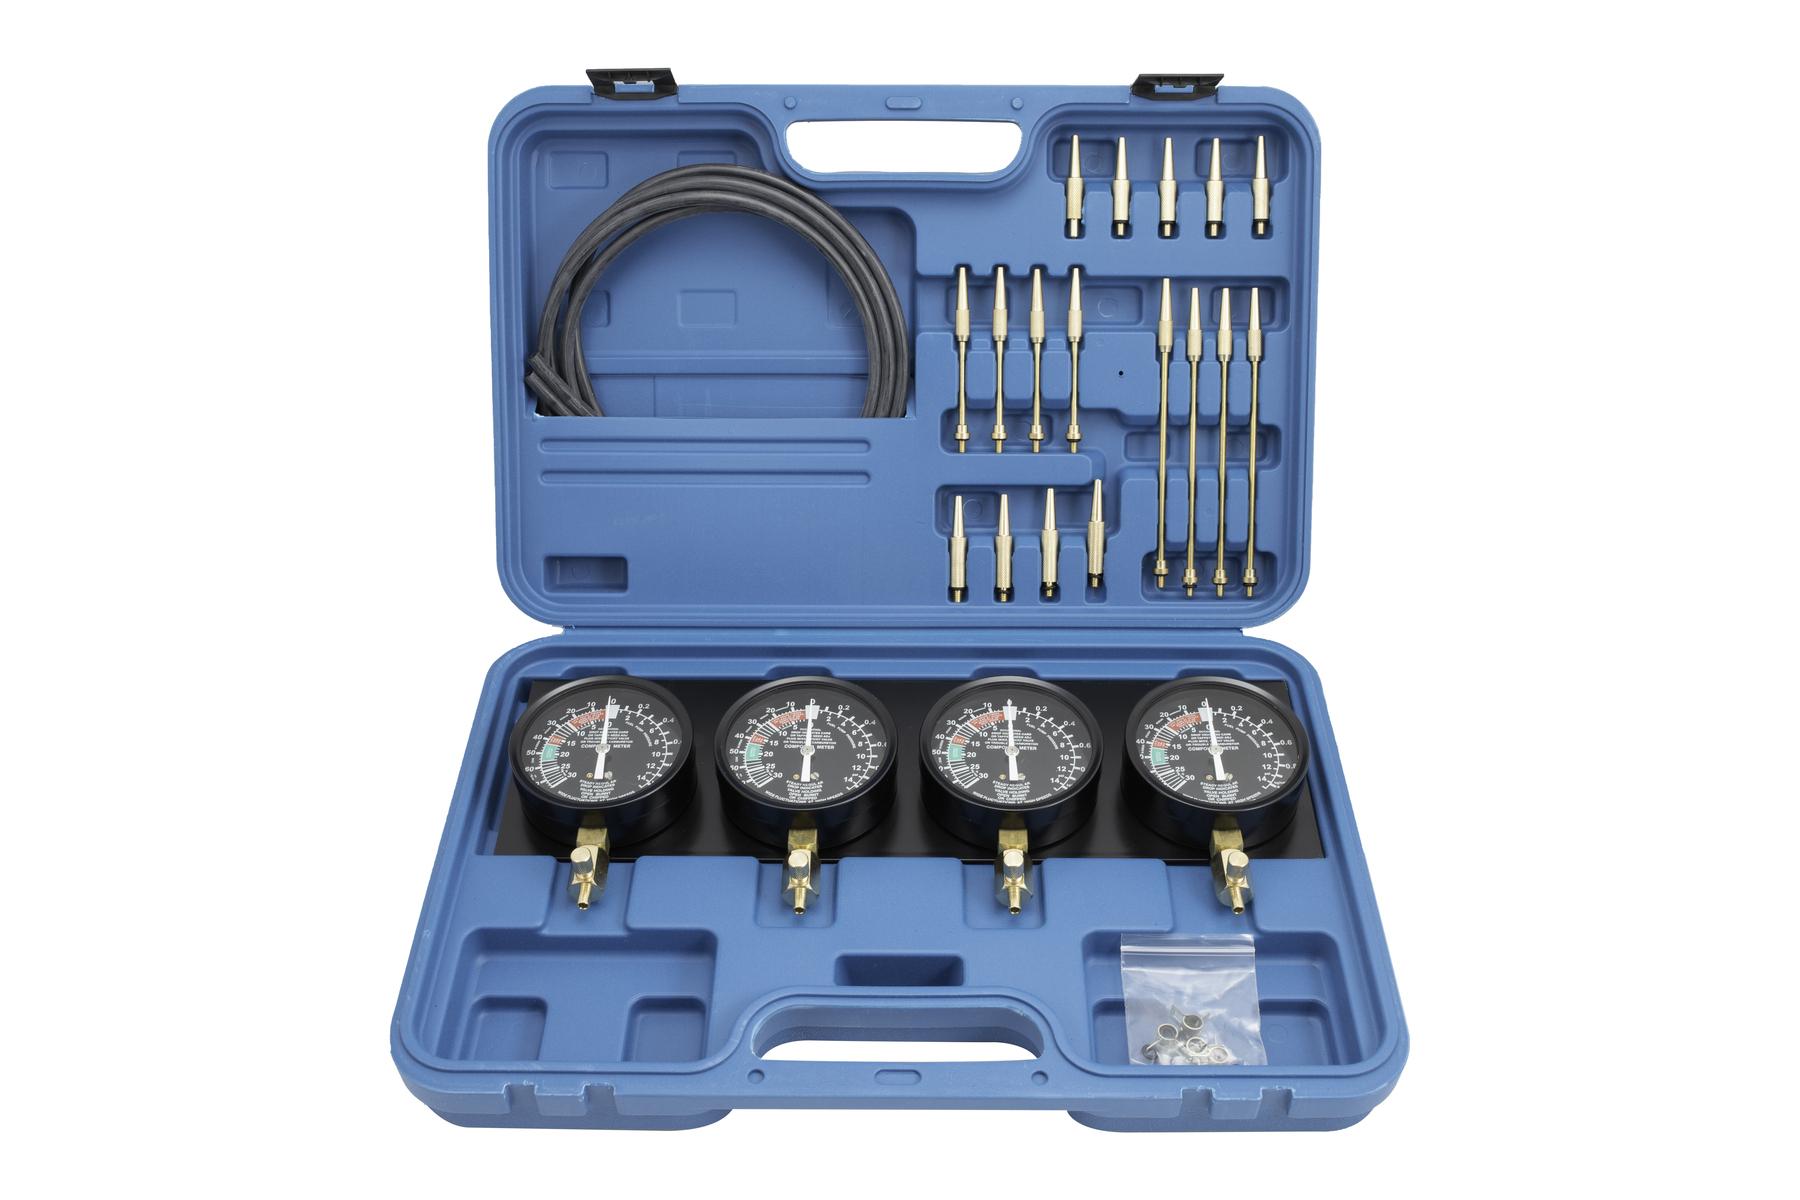 Tester na synchronizaci karburátorů, vakuometry + redukce - QUATROS QS30504